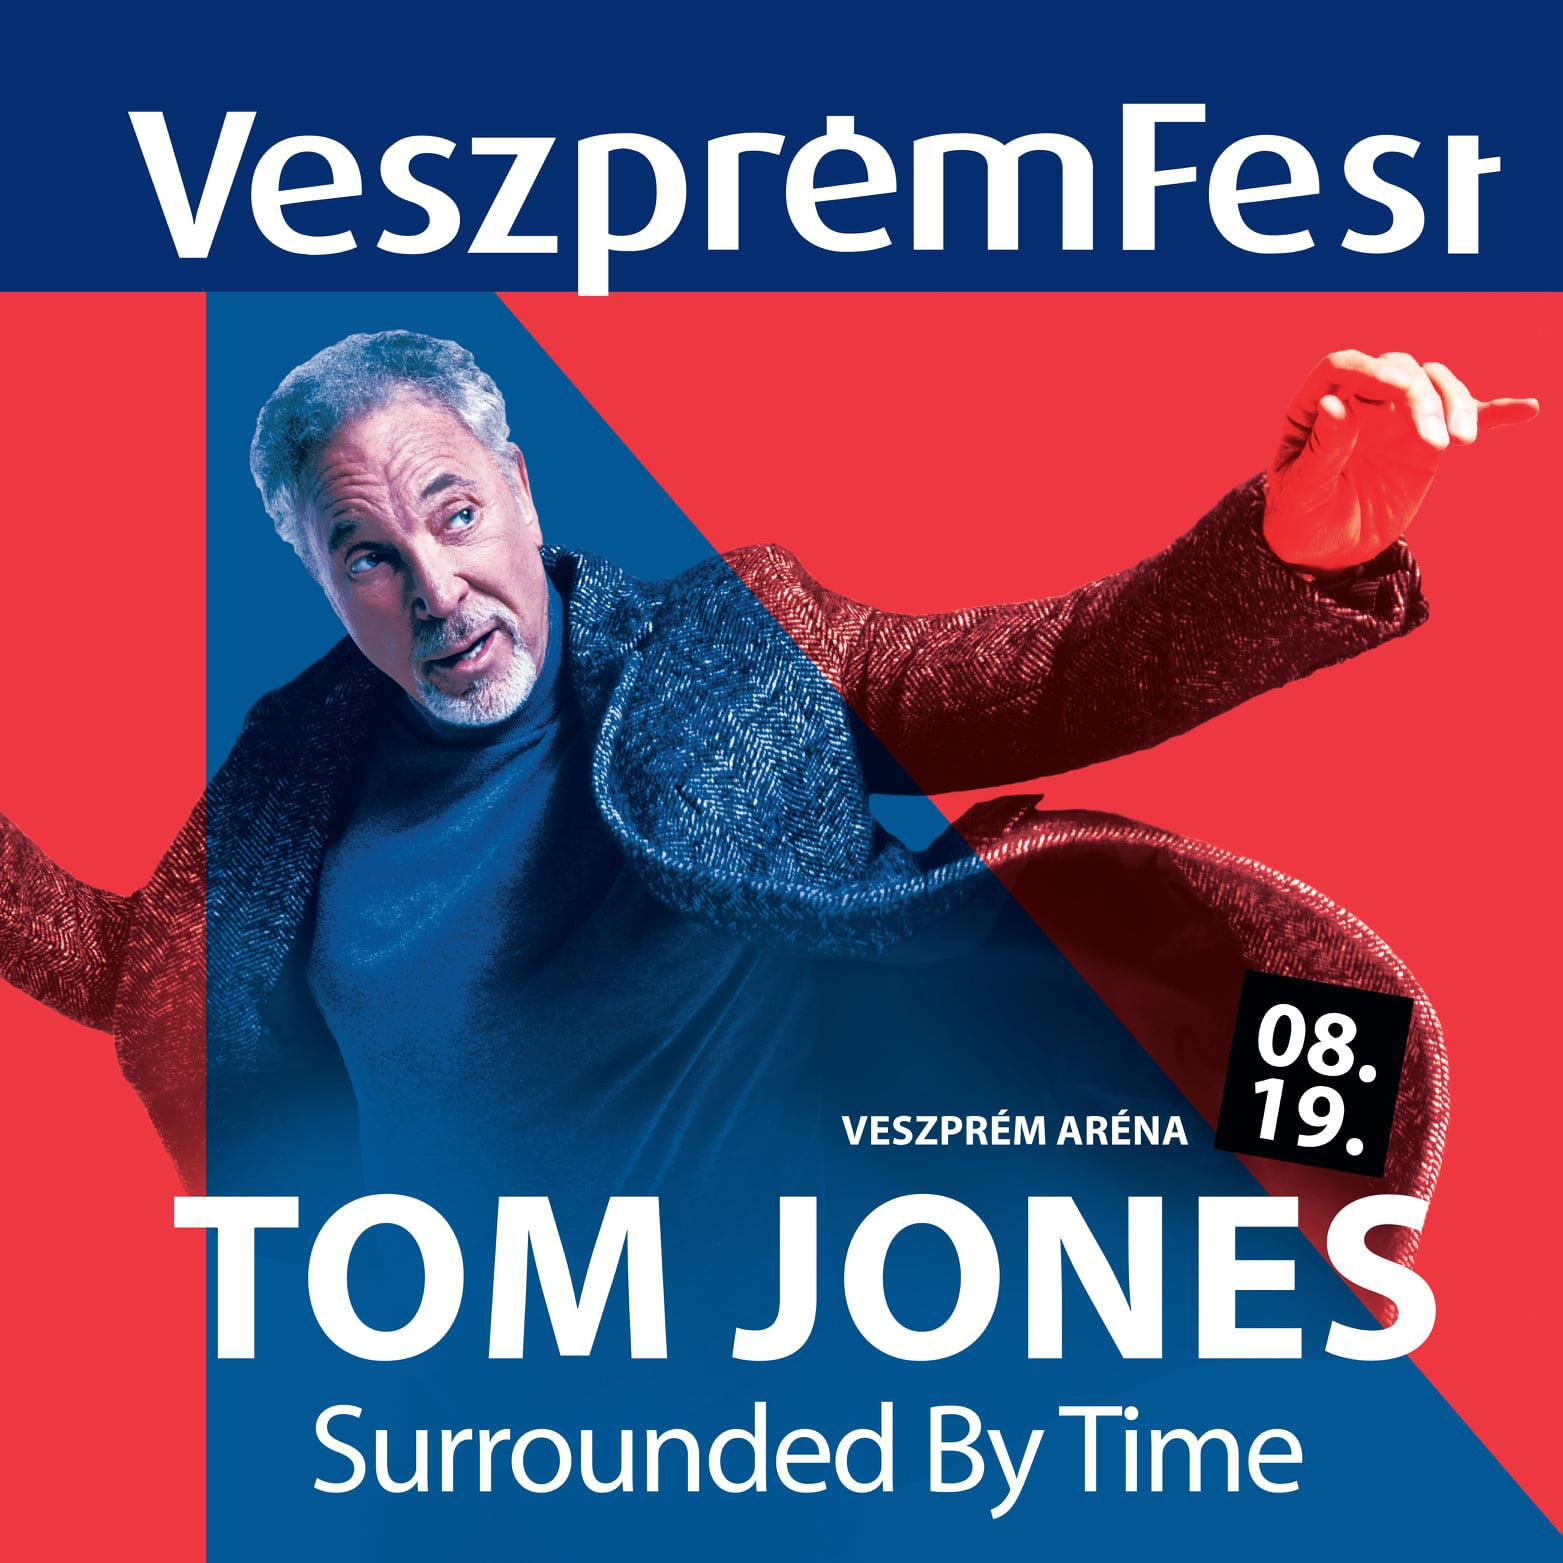 VeszprémFest, Tom Jones